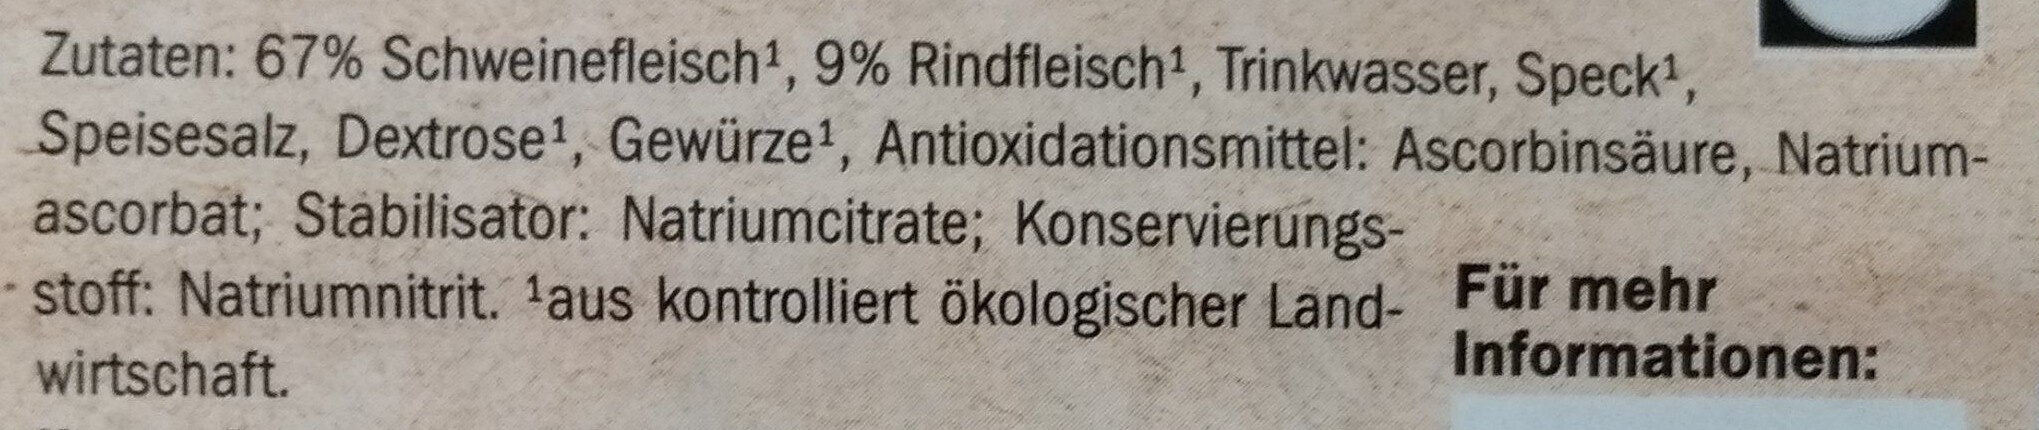 Saucisson de jambon bio - Ingredients